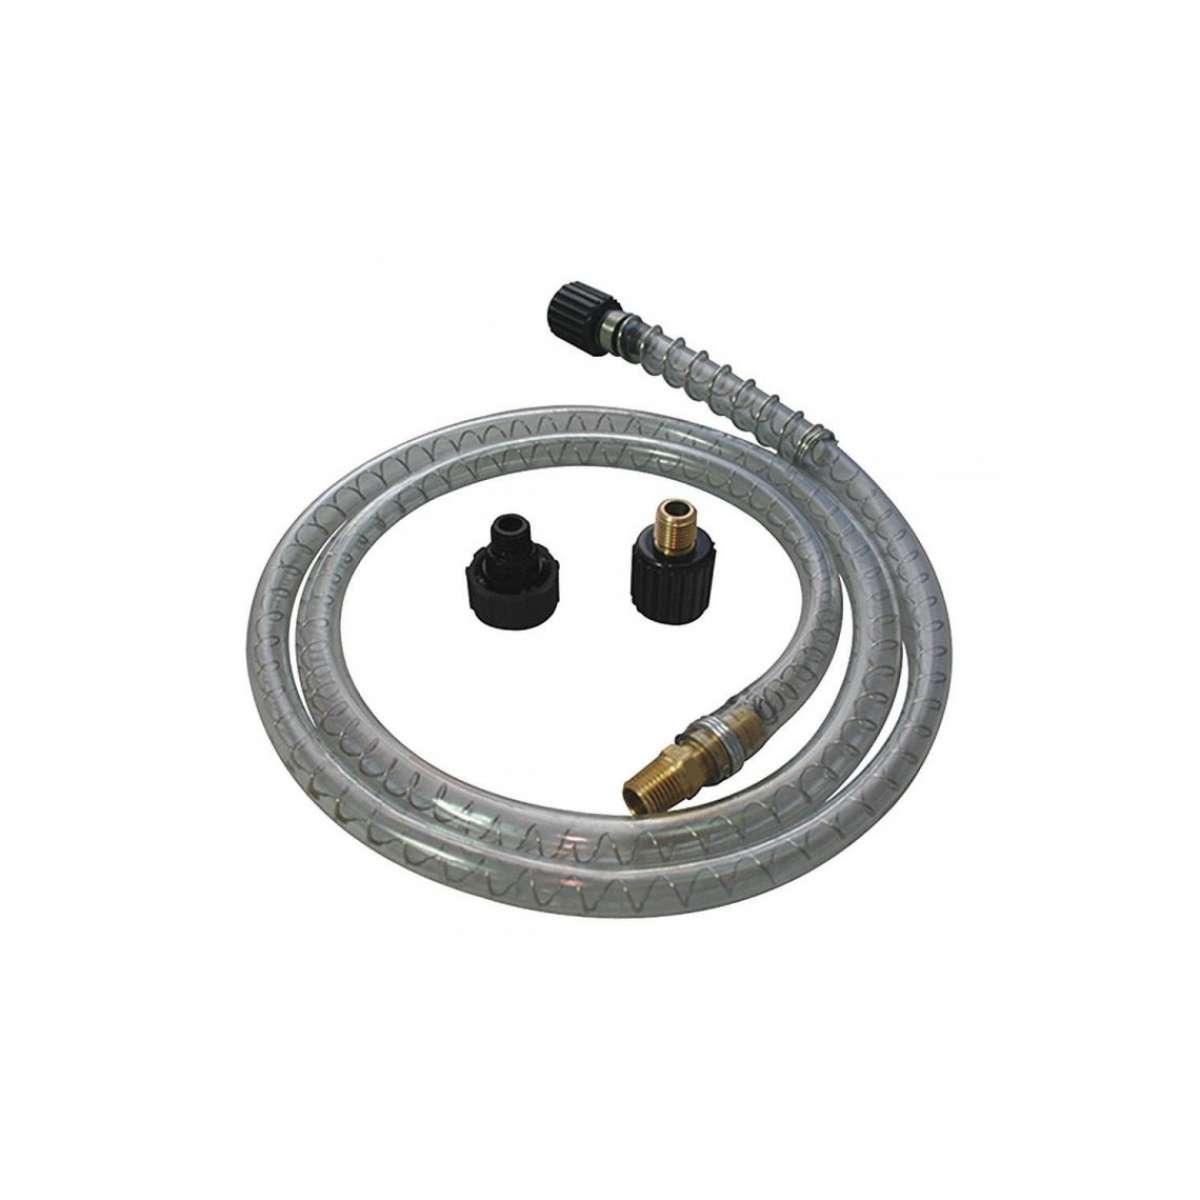 Premium Pump Quick Connect Kit (5 Foot Hose System)